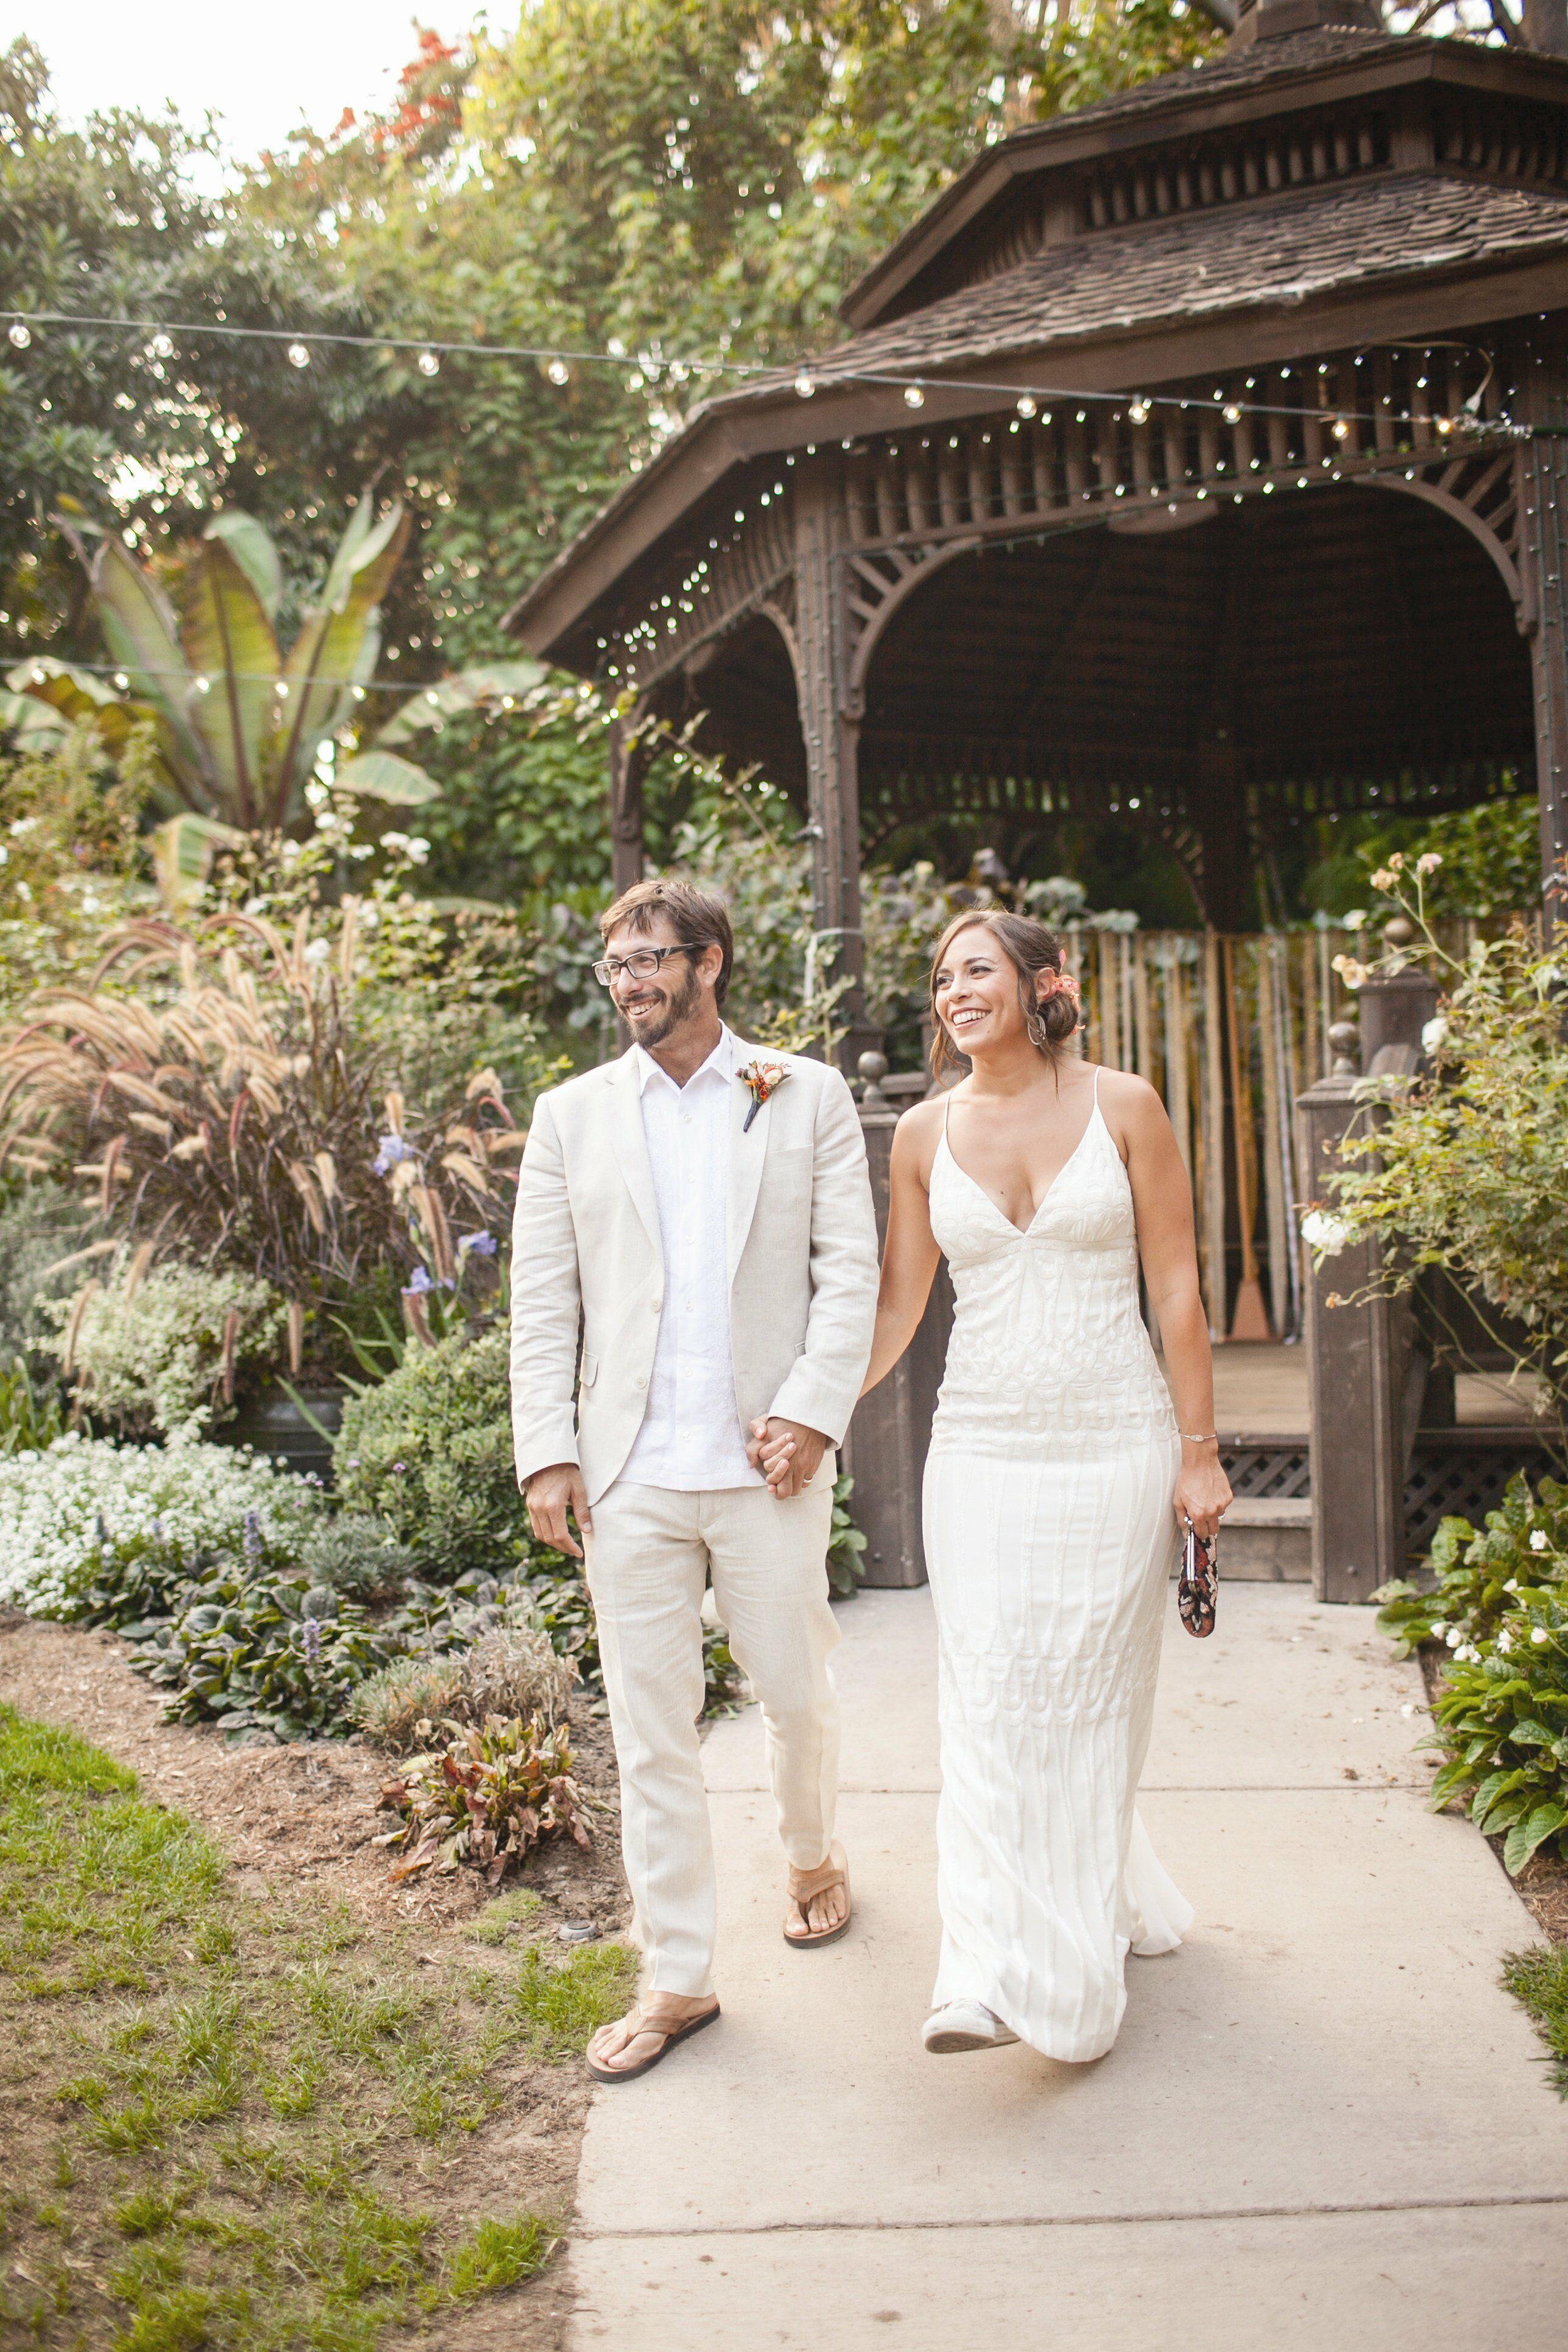 A Rustic Wedding at San Diego Botanical Gardens in ...